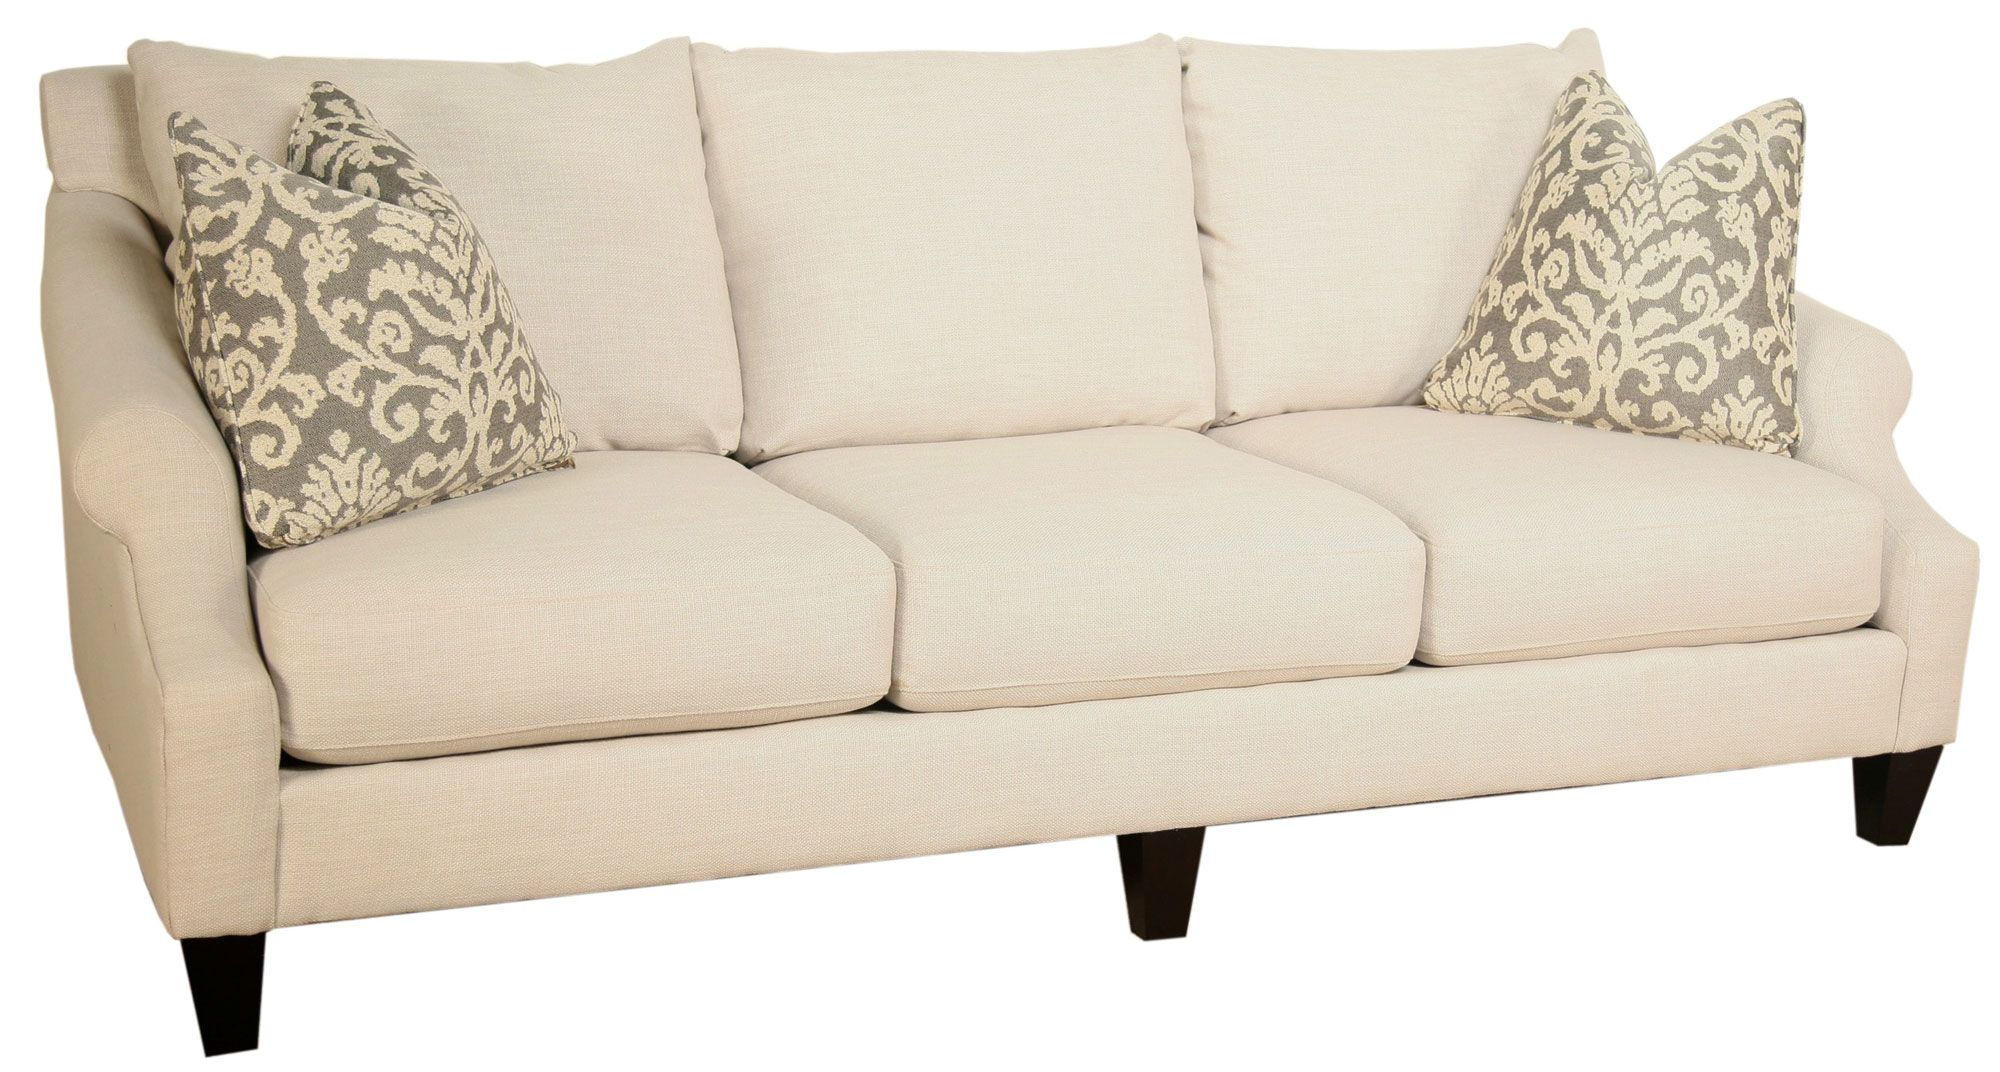 Hadley Sofa Bauhaus Furnishings, Furniture